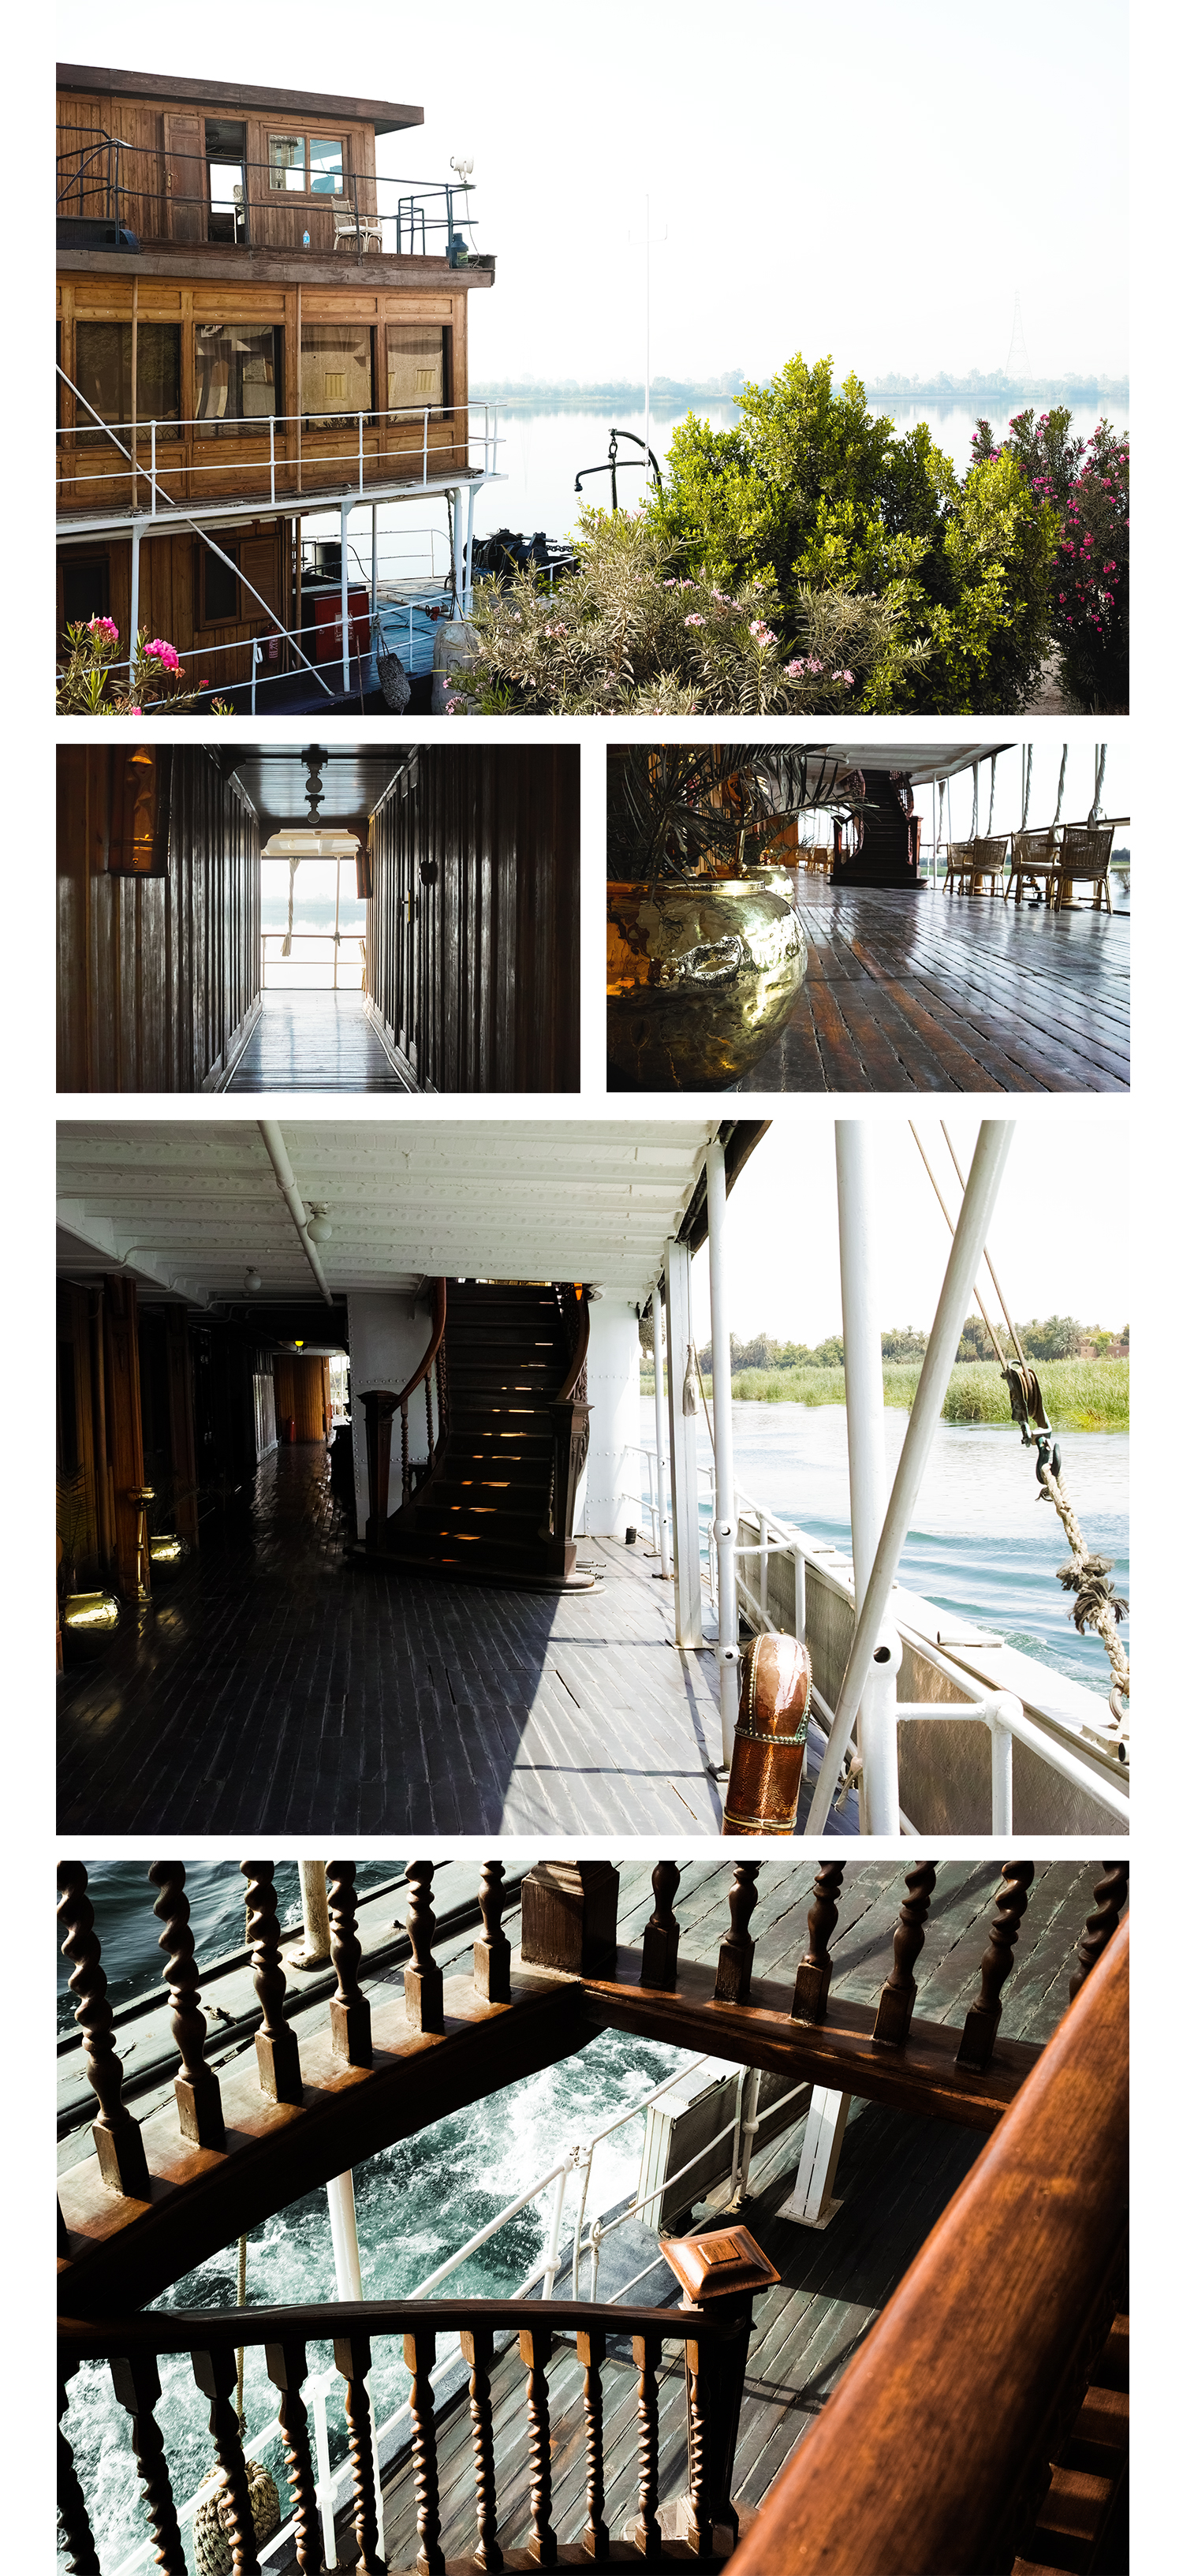 d-_mes-documents_blog_paradise-search-steam-ship-sudan_3